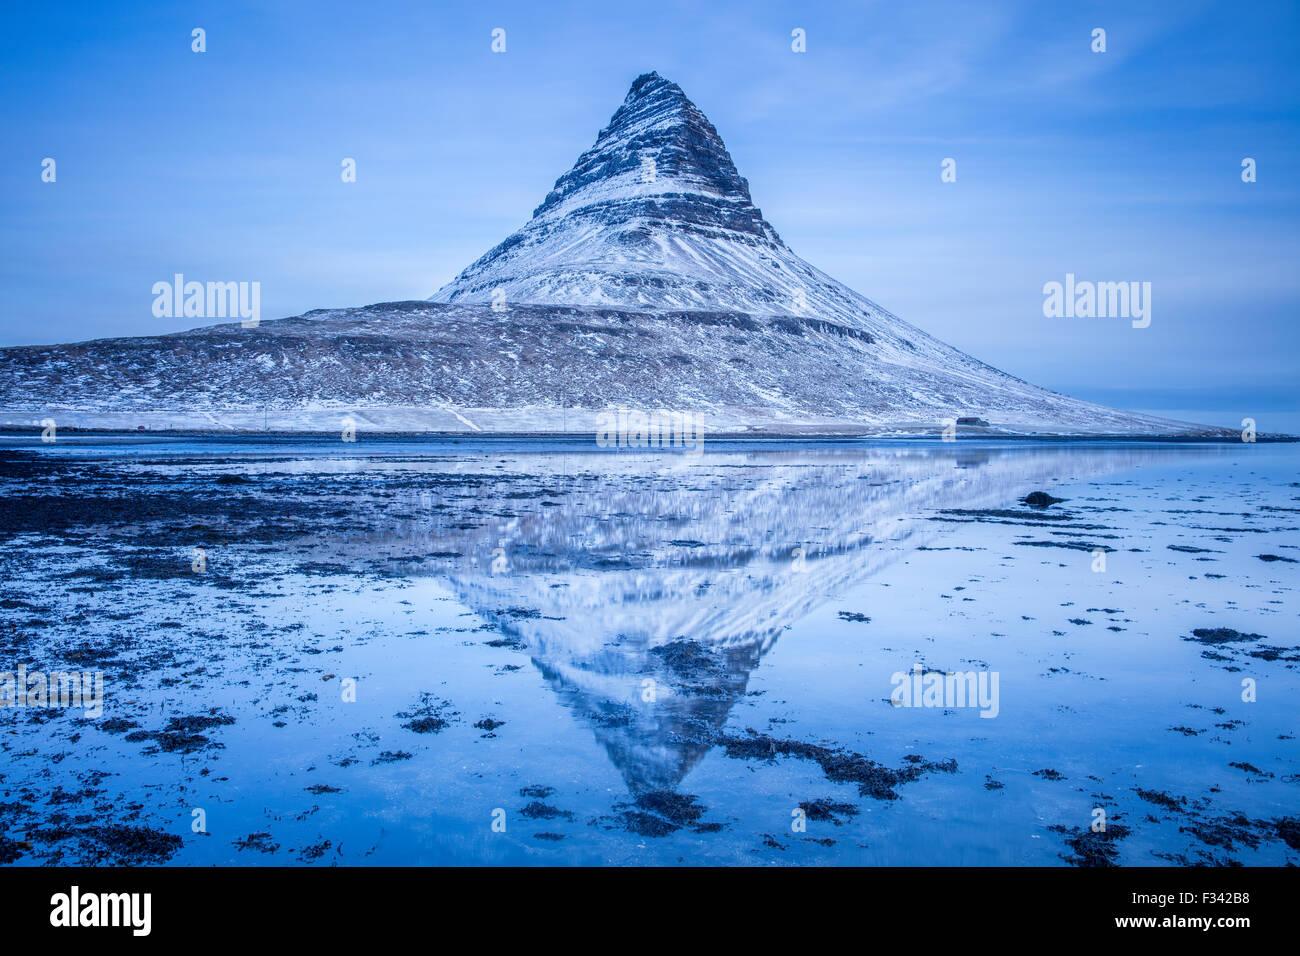 Kirkjufell at dawn, Snaefellsness Peninsula, Iceland - Stock Image